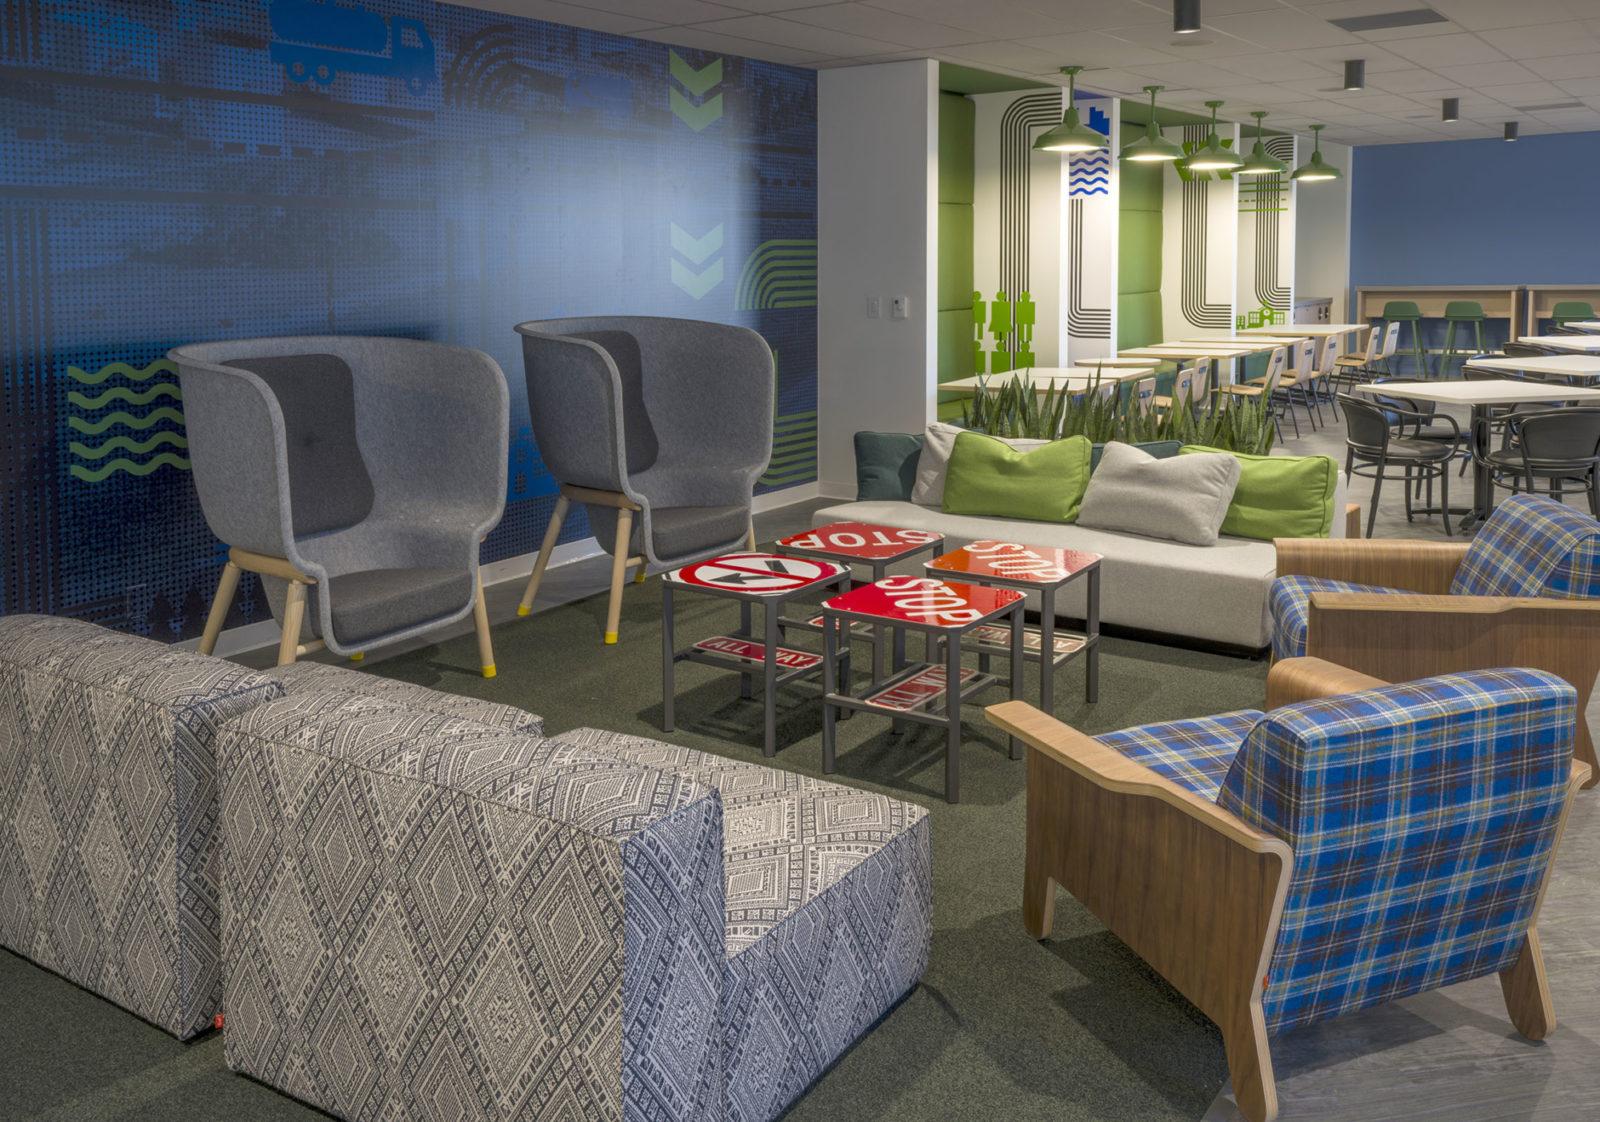 18th Floor Employee Lounge Blue